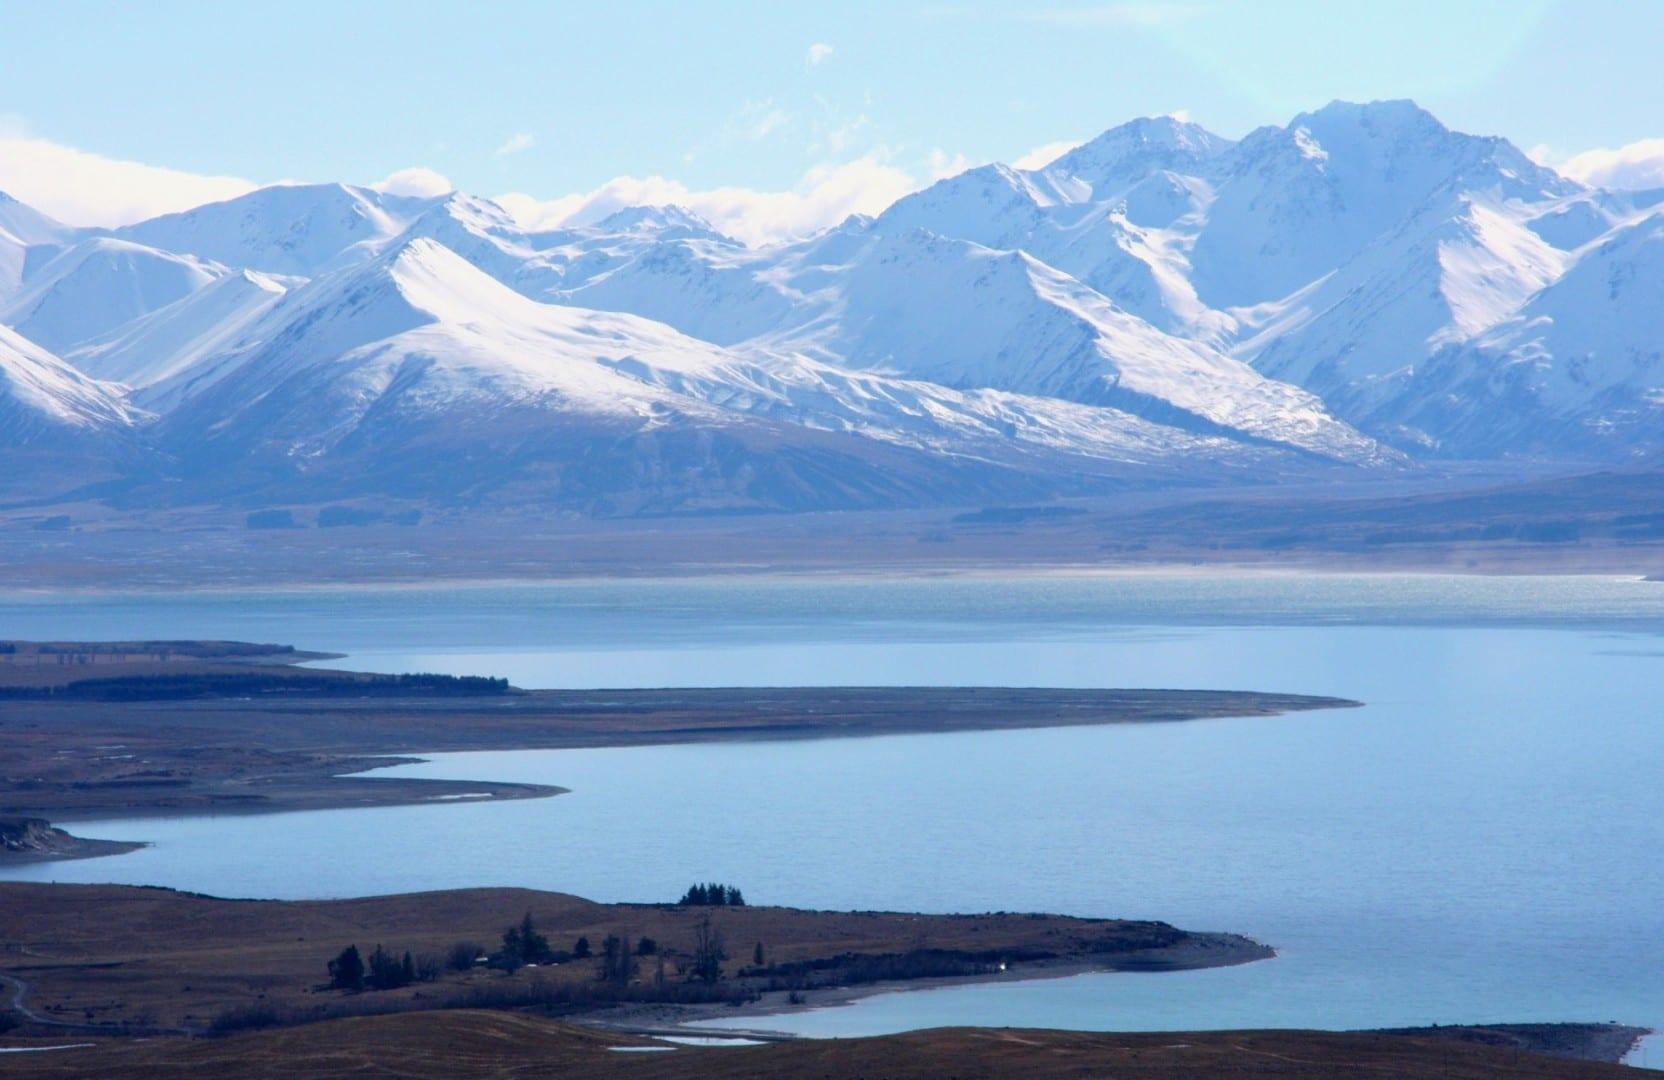 Vista hacia el extremo norte del Lago Tekapo desde la cima del Monte John Lago Tékapo Nueva Zelanda